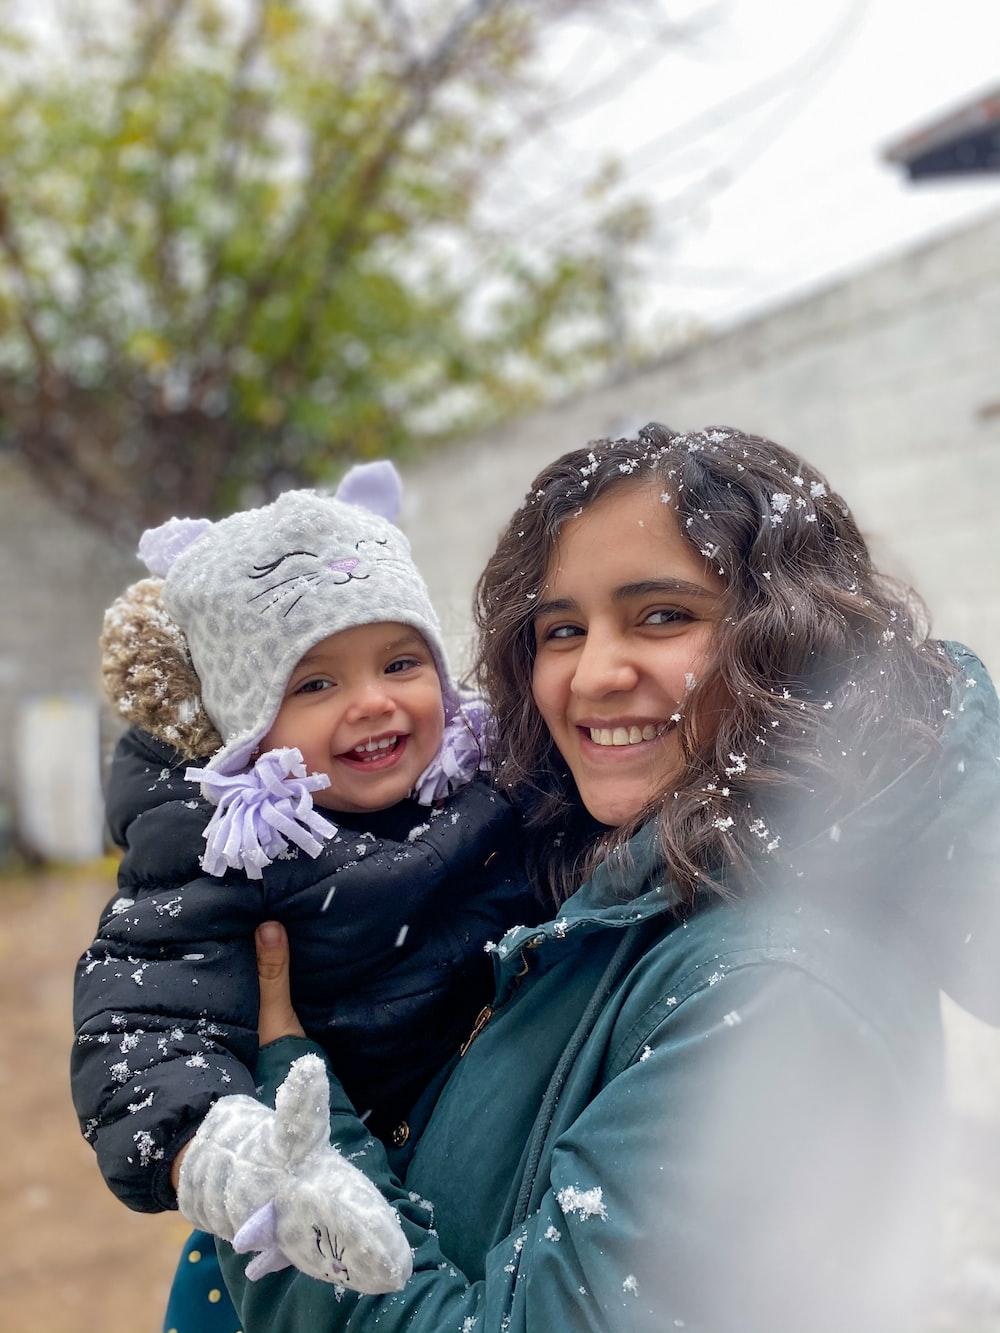 2 women smiling while taking photo